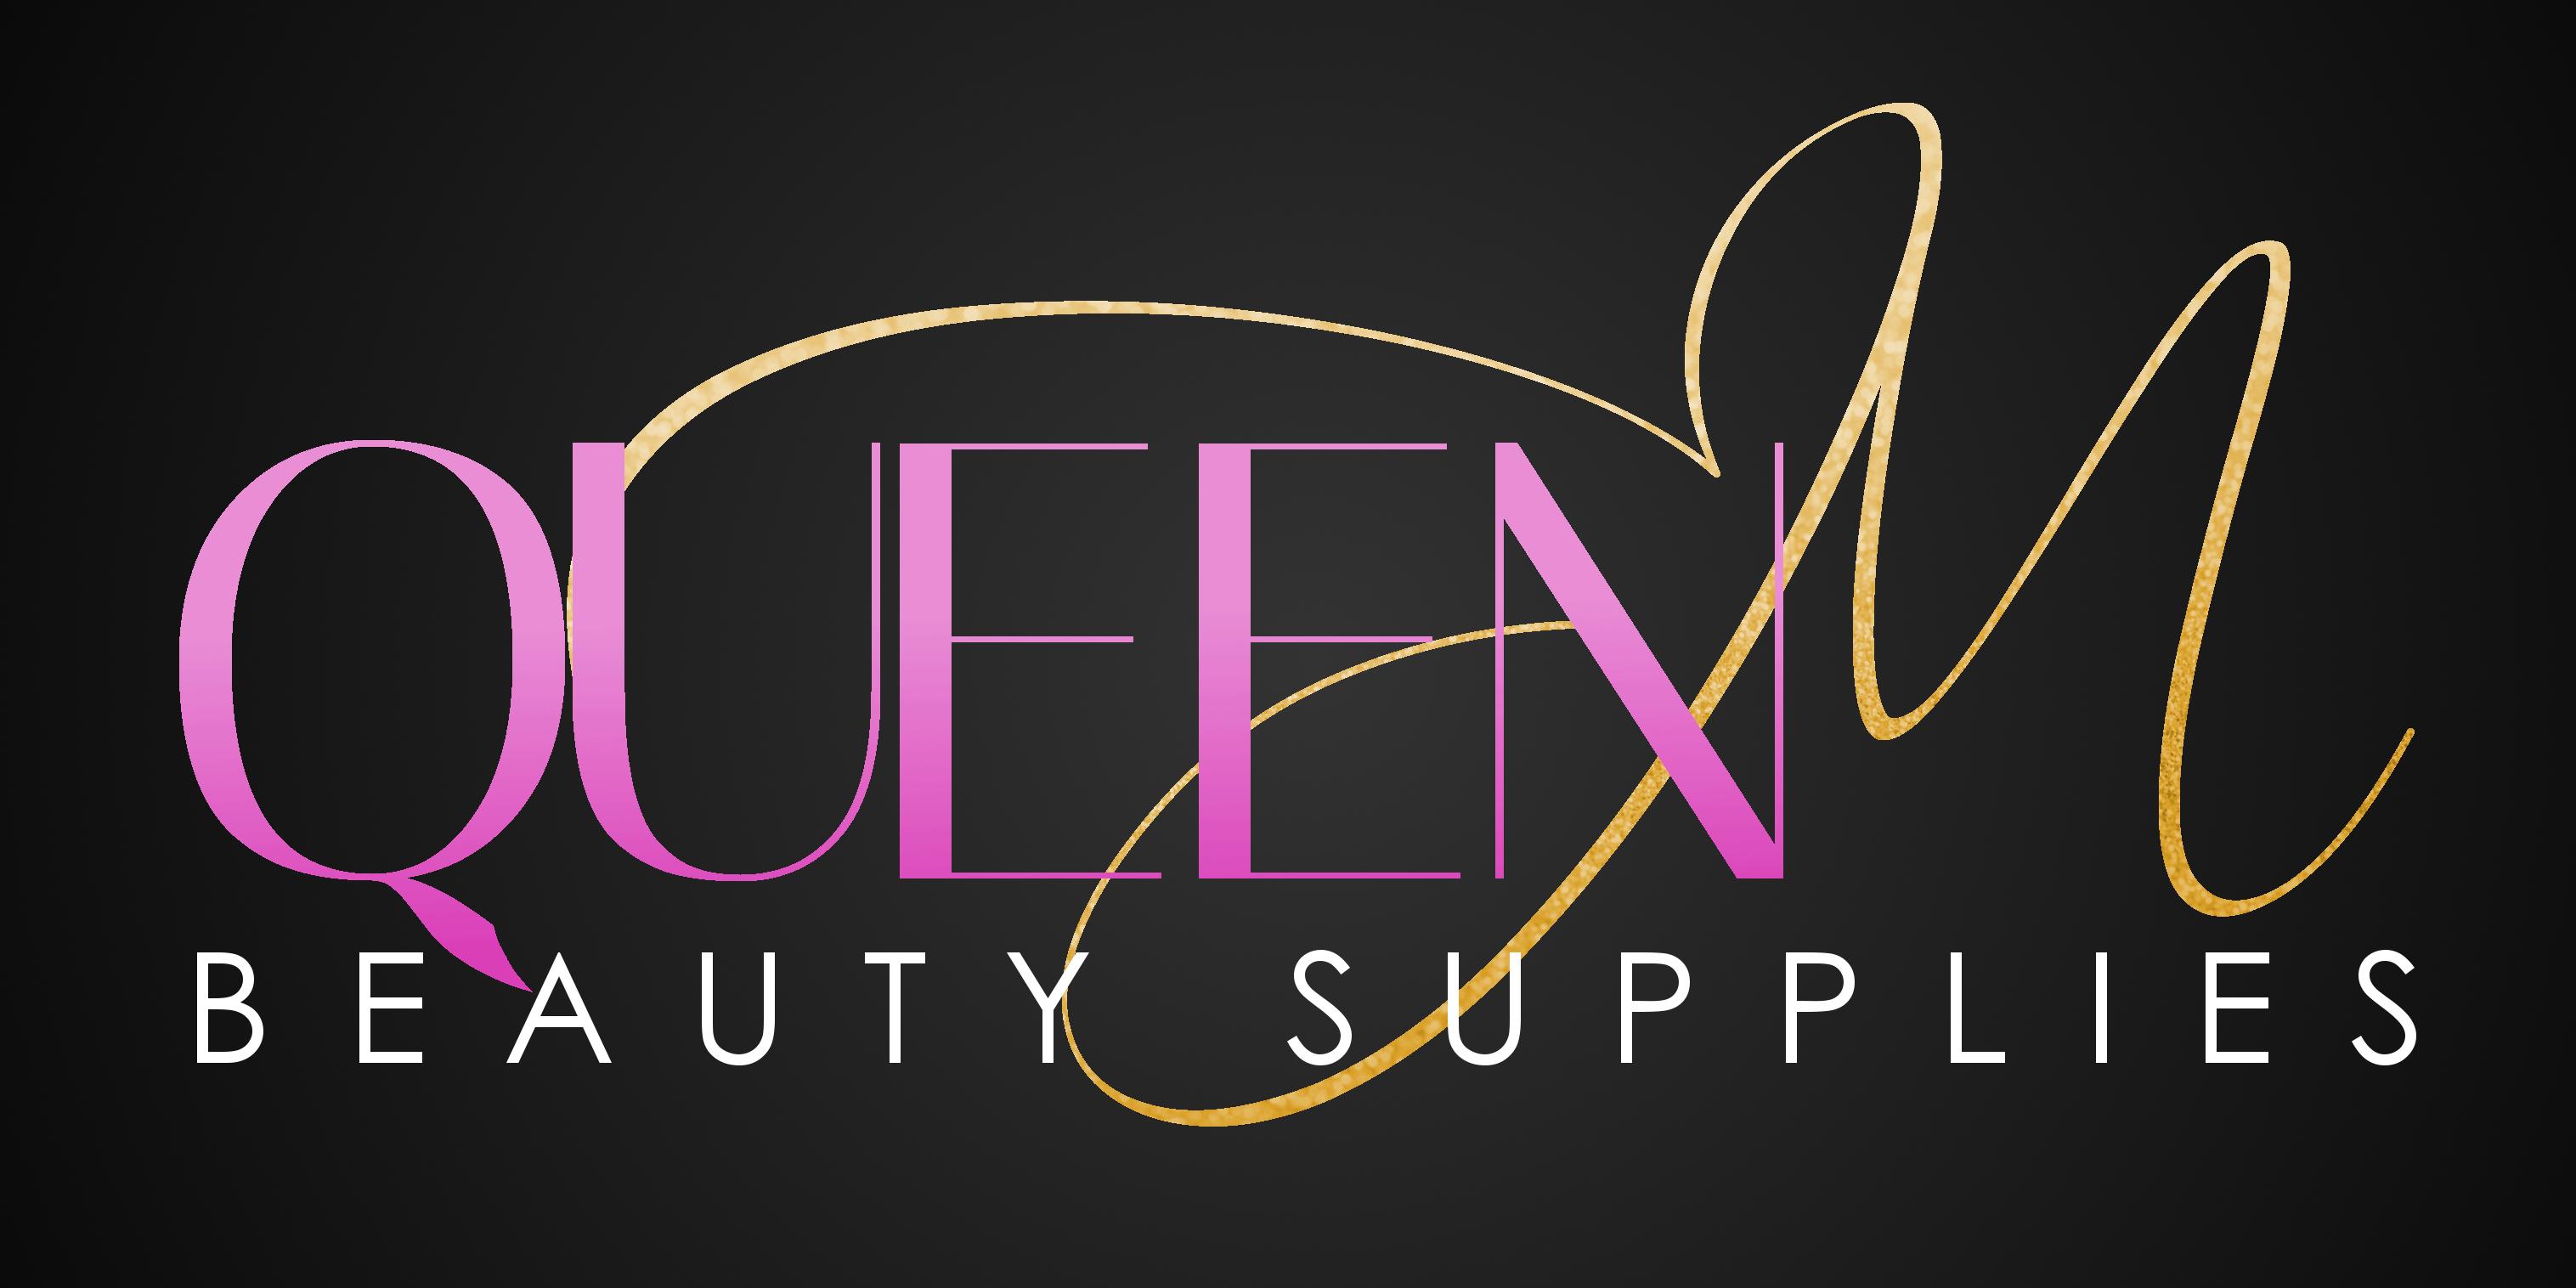 QueenMBeautySupplies_color1a